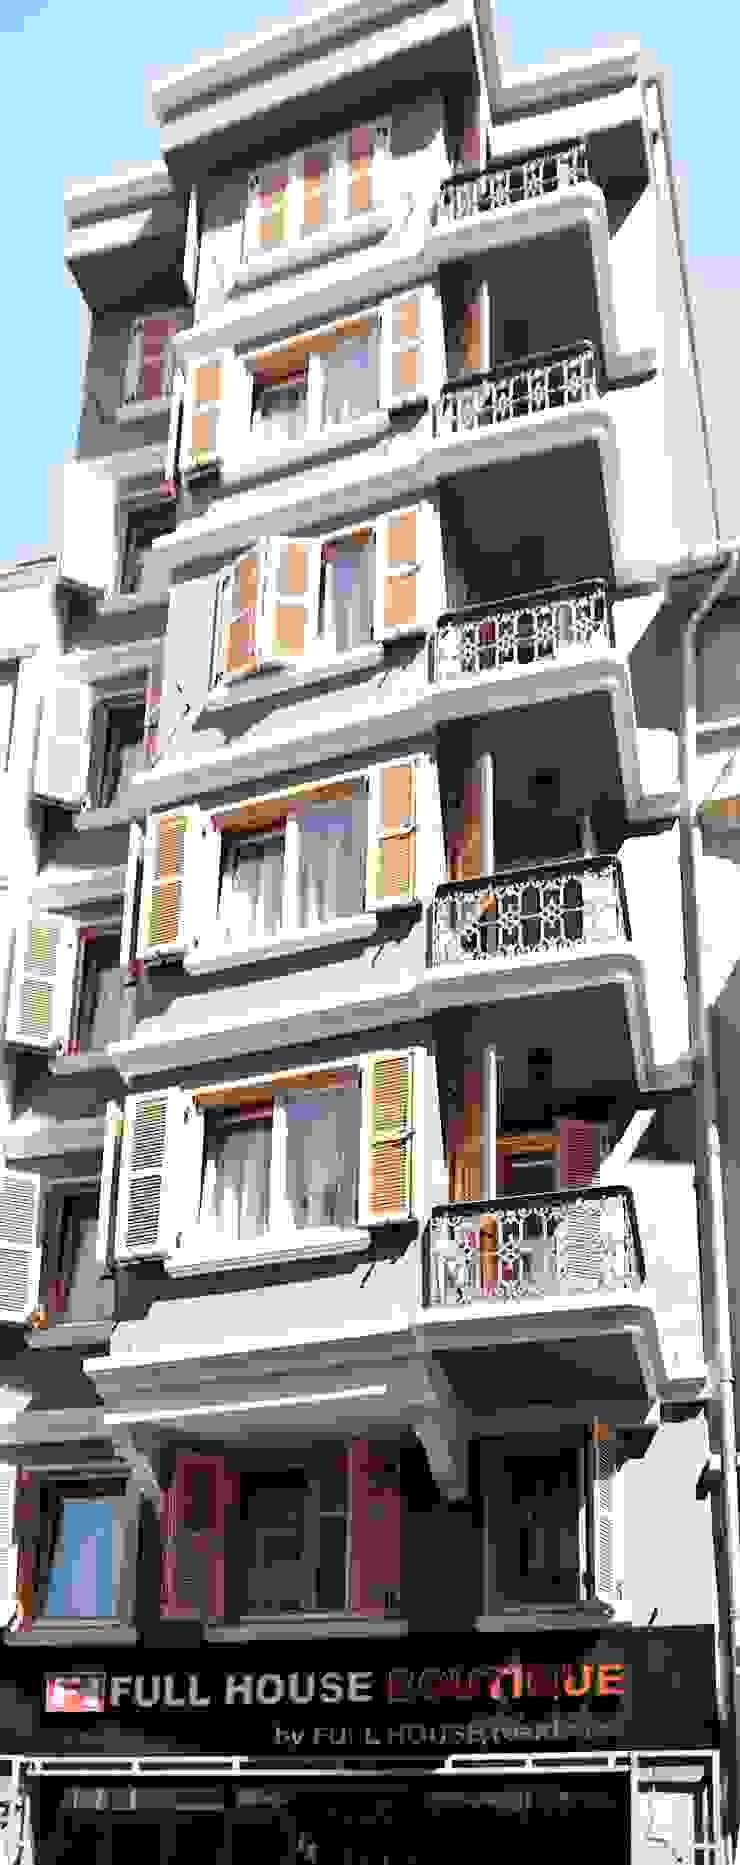 Tarlabası Boutique Aredeko Art & Design Rustic style house